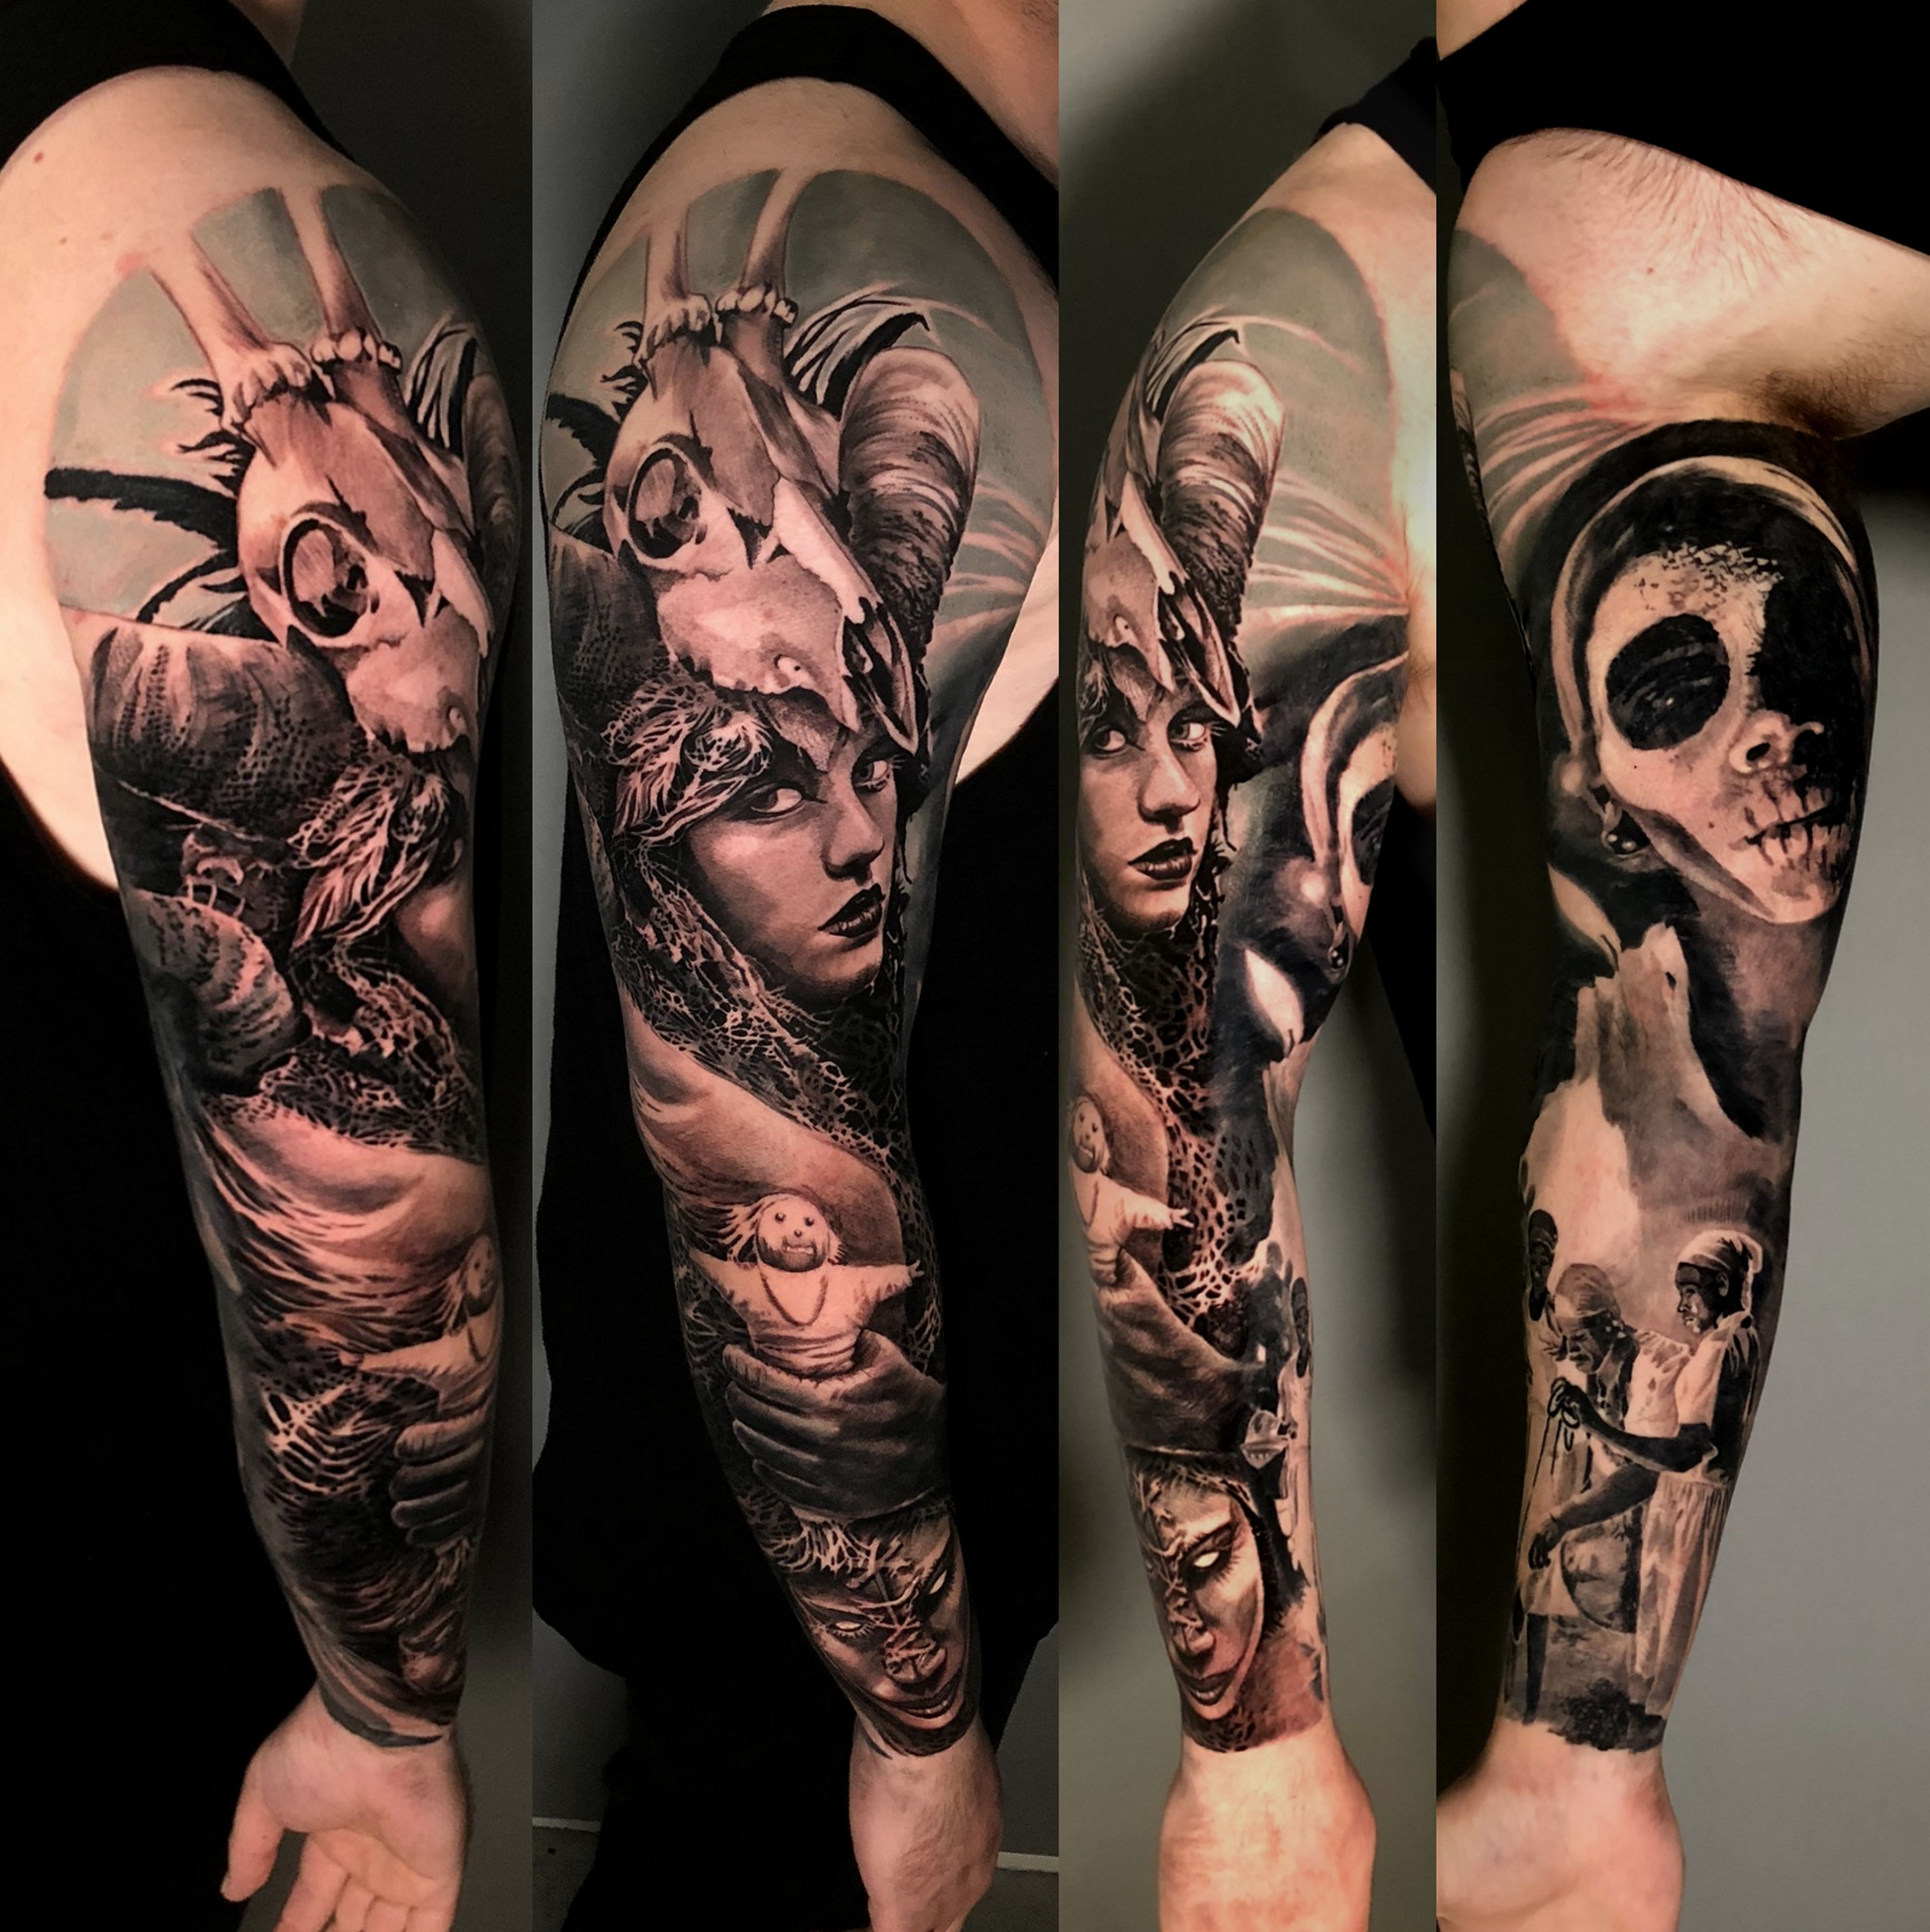 Voodoo Sleeve In Progress Grey Tattoo Tattoos Sleeve Tattoos